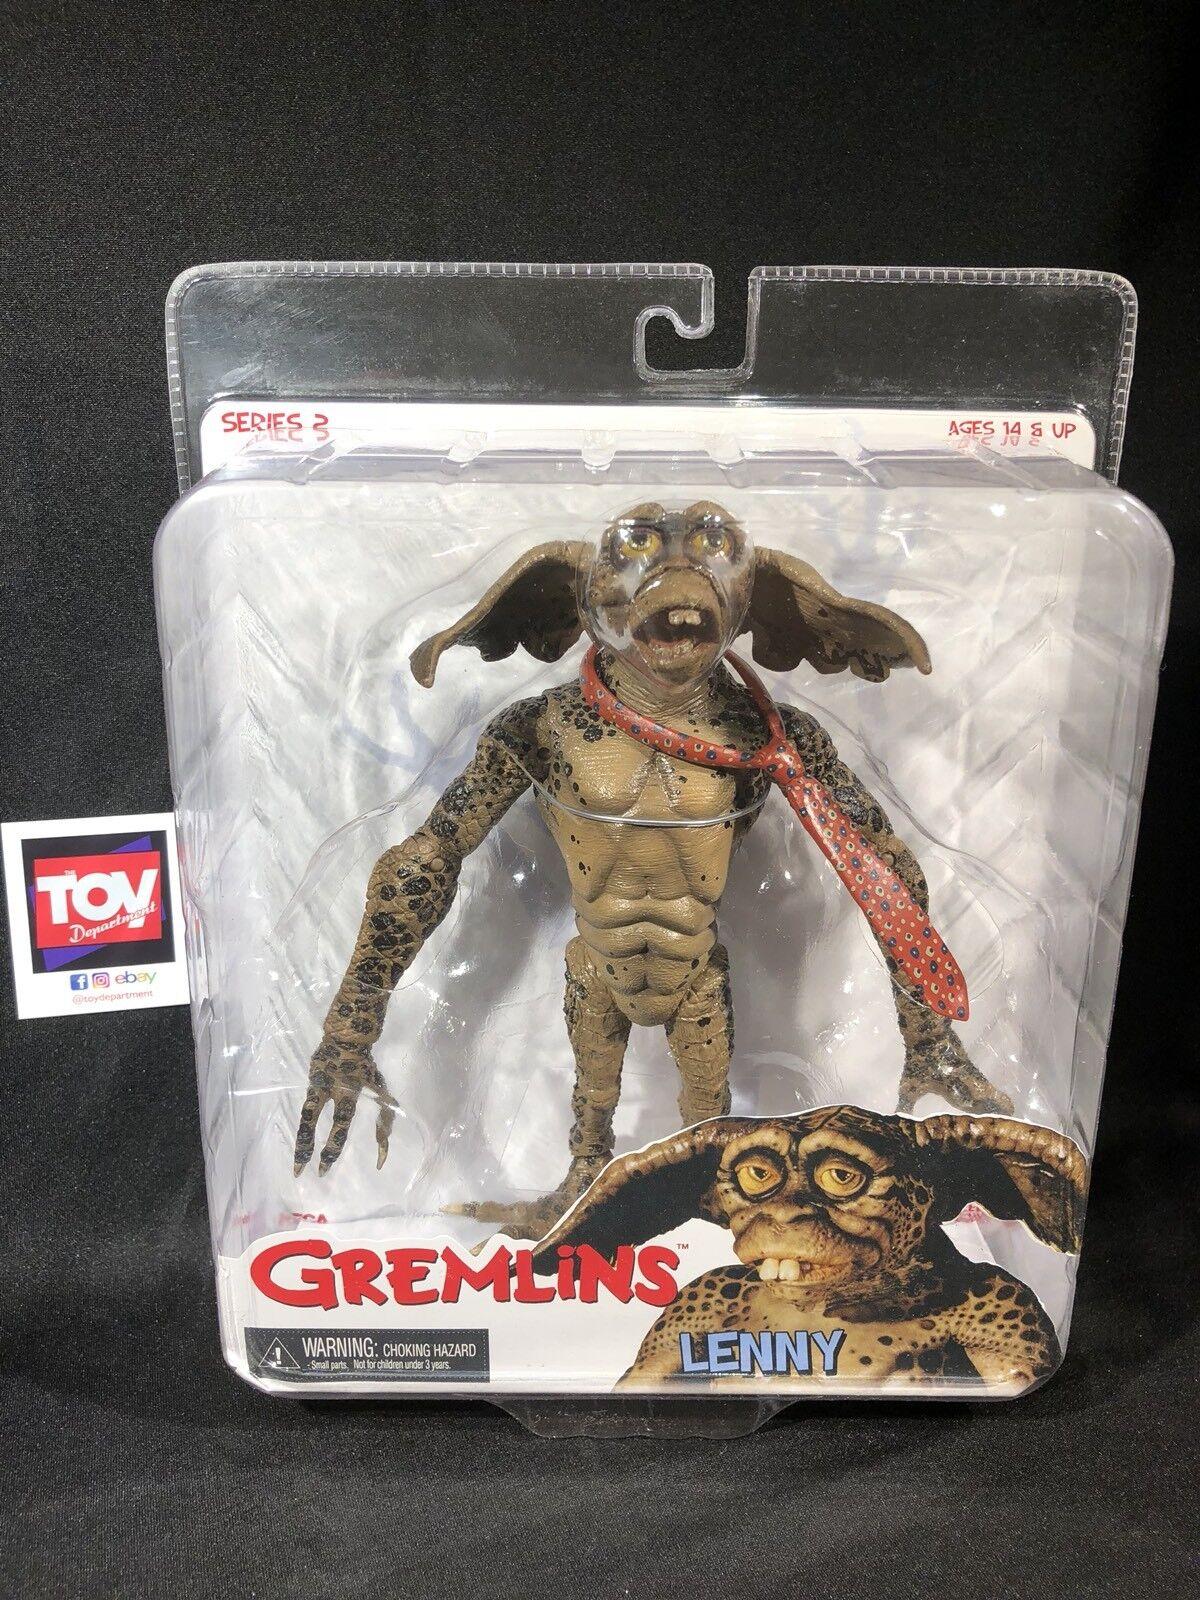 NECA Reel Toys GREMLINS Series 2 LENNY 7